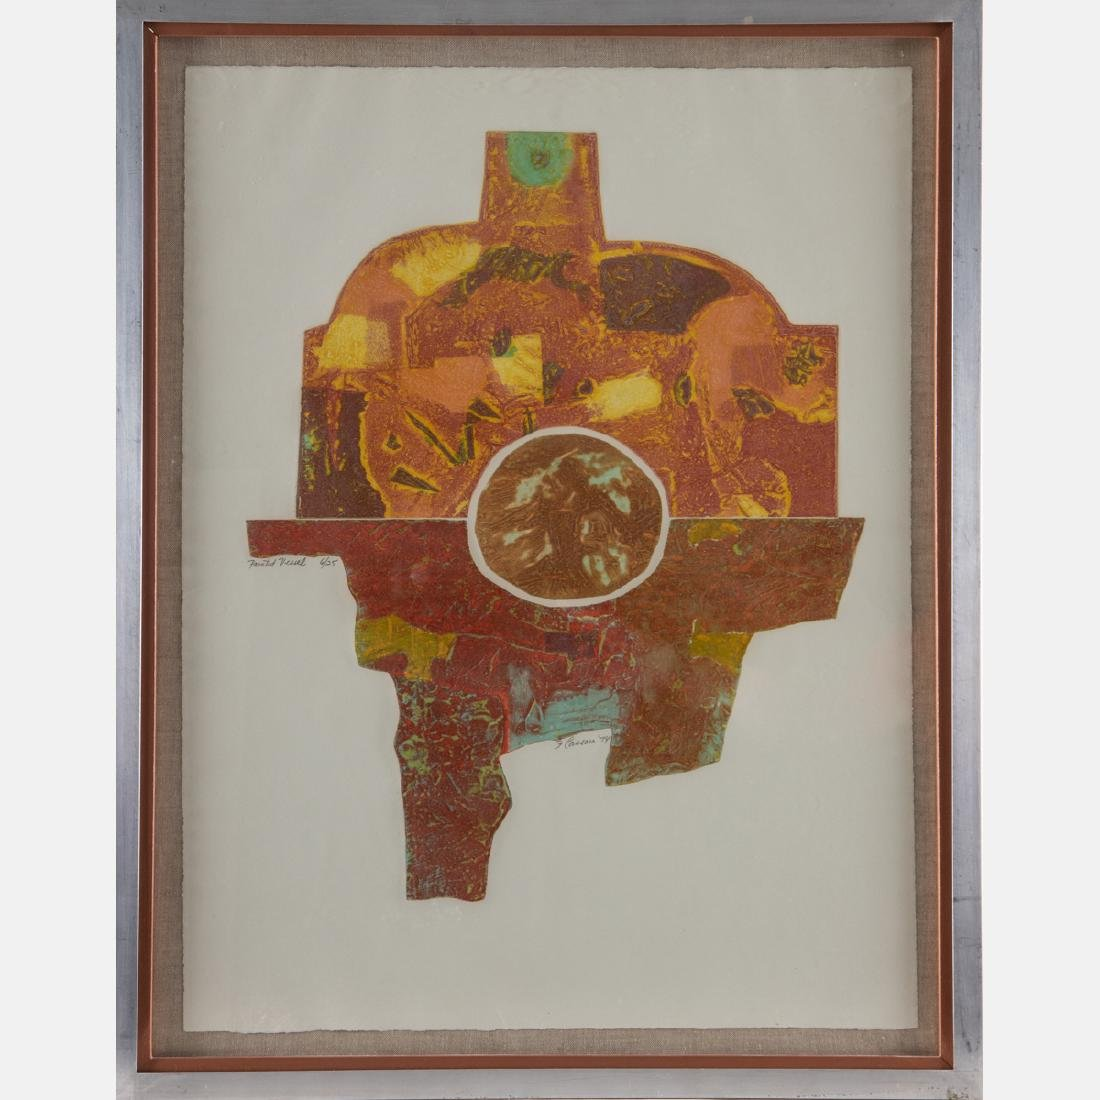 Frank Cassara (b. 1913) Painted Vessel, 1974, - 2